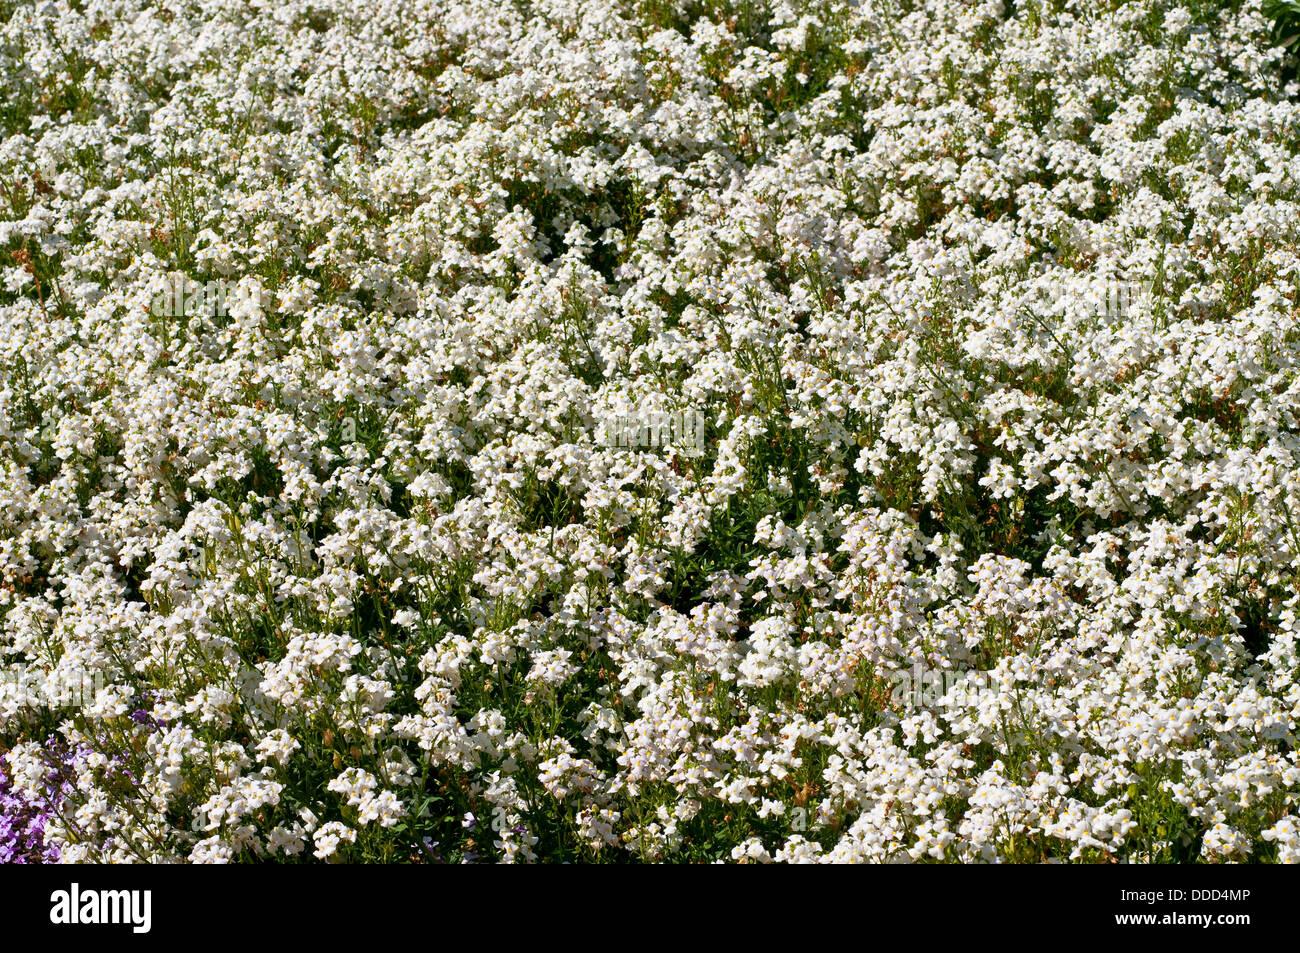 Plant nemesia stock photos plant nemesia stock images alamy summer flowerbed with nemesia poetry white flowers stock image mightylinksfo